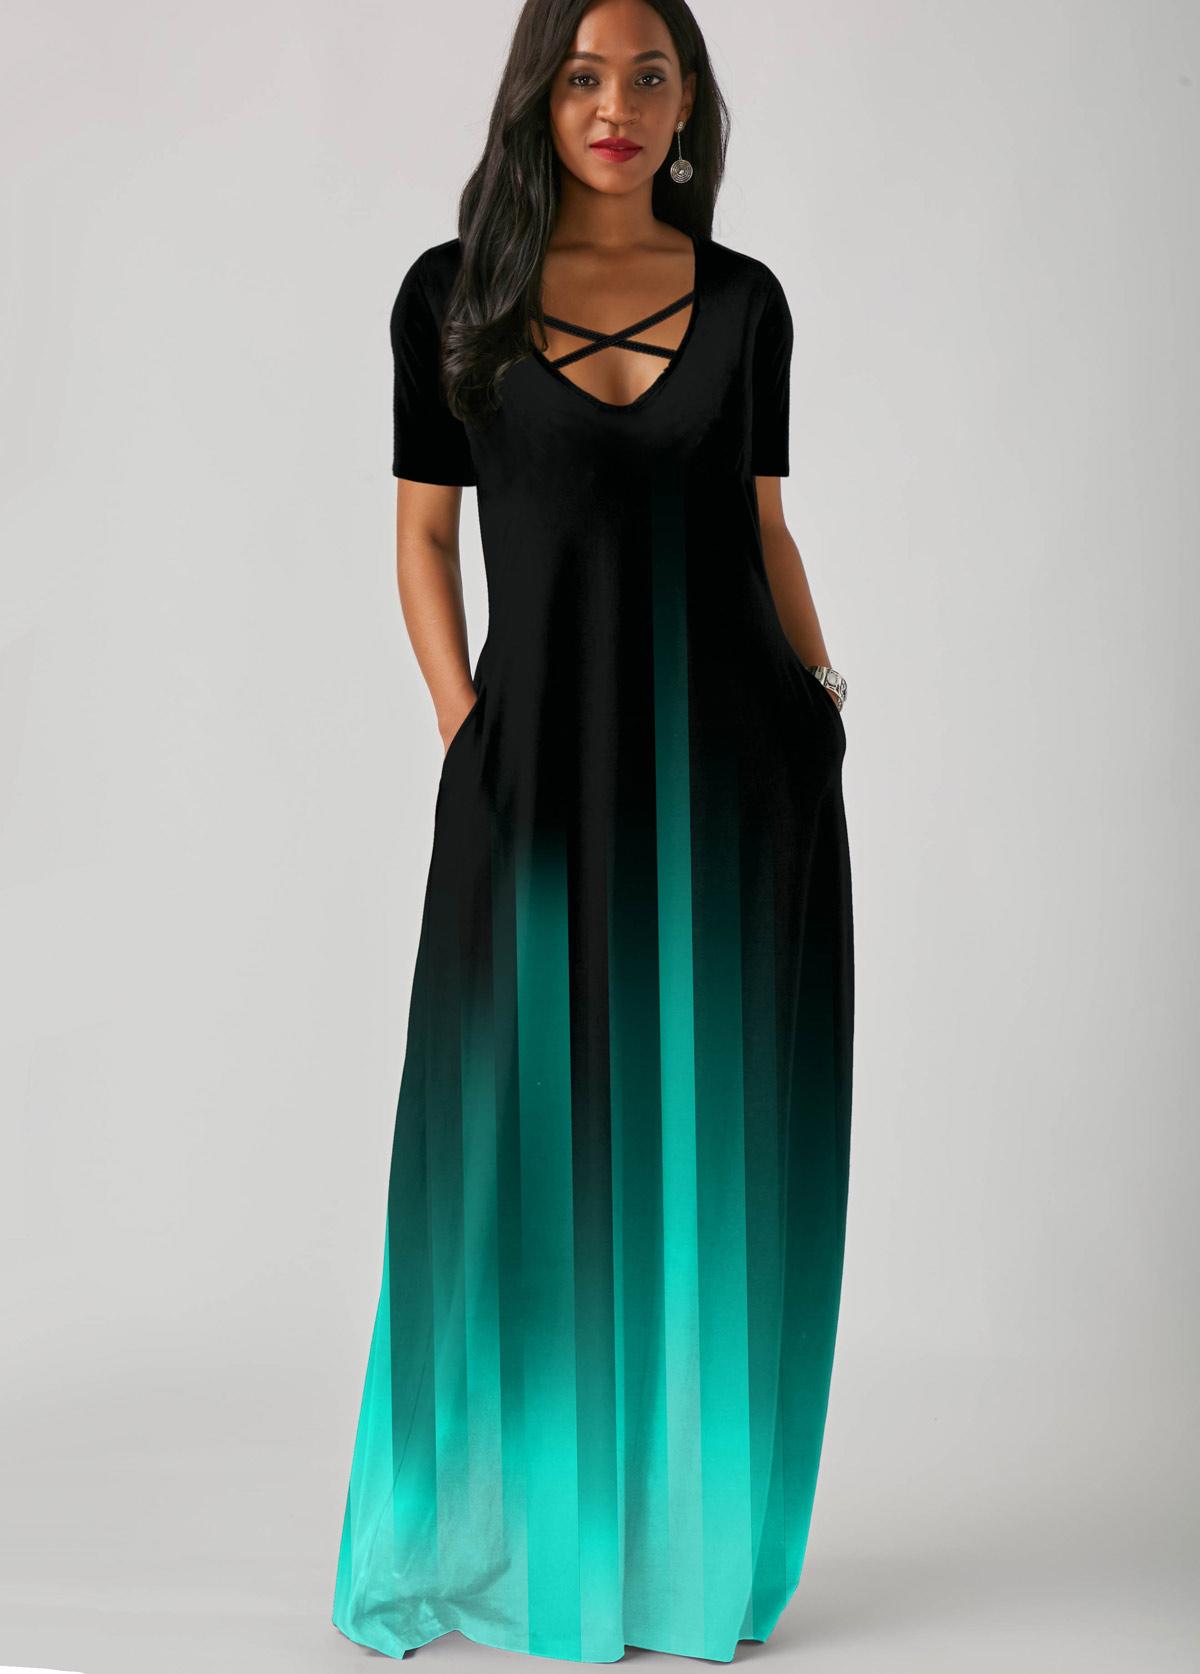 ROTITA Side Pocket Mint Green Gradient Short Sleeve Maxi Dress